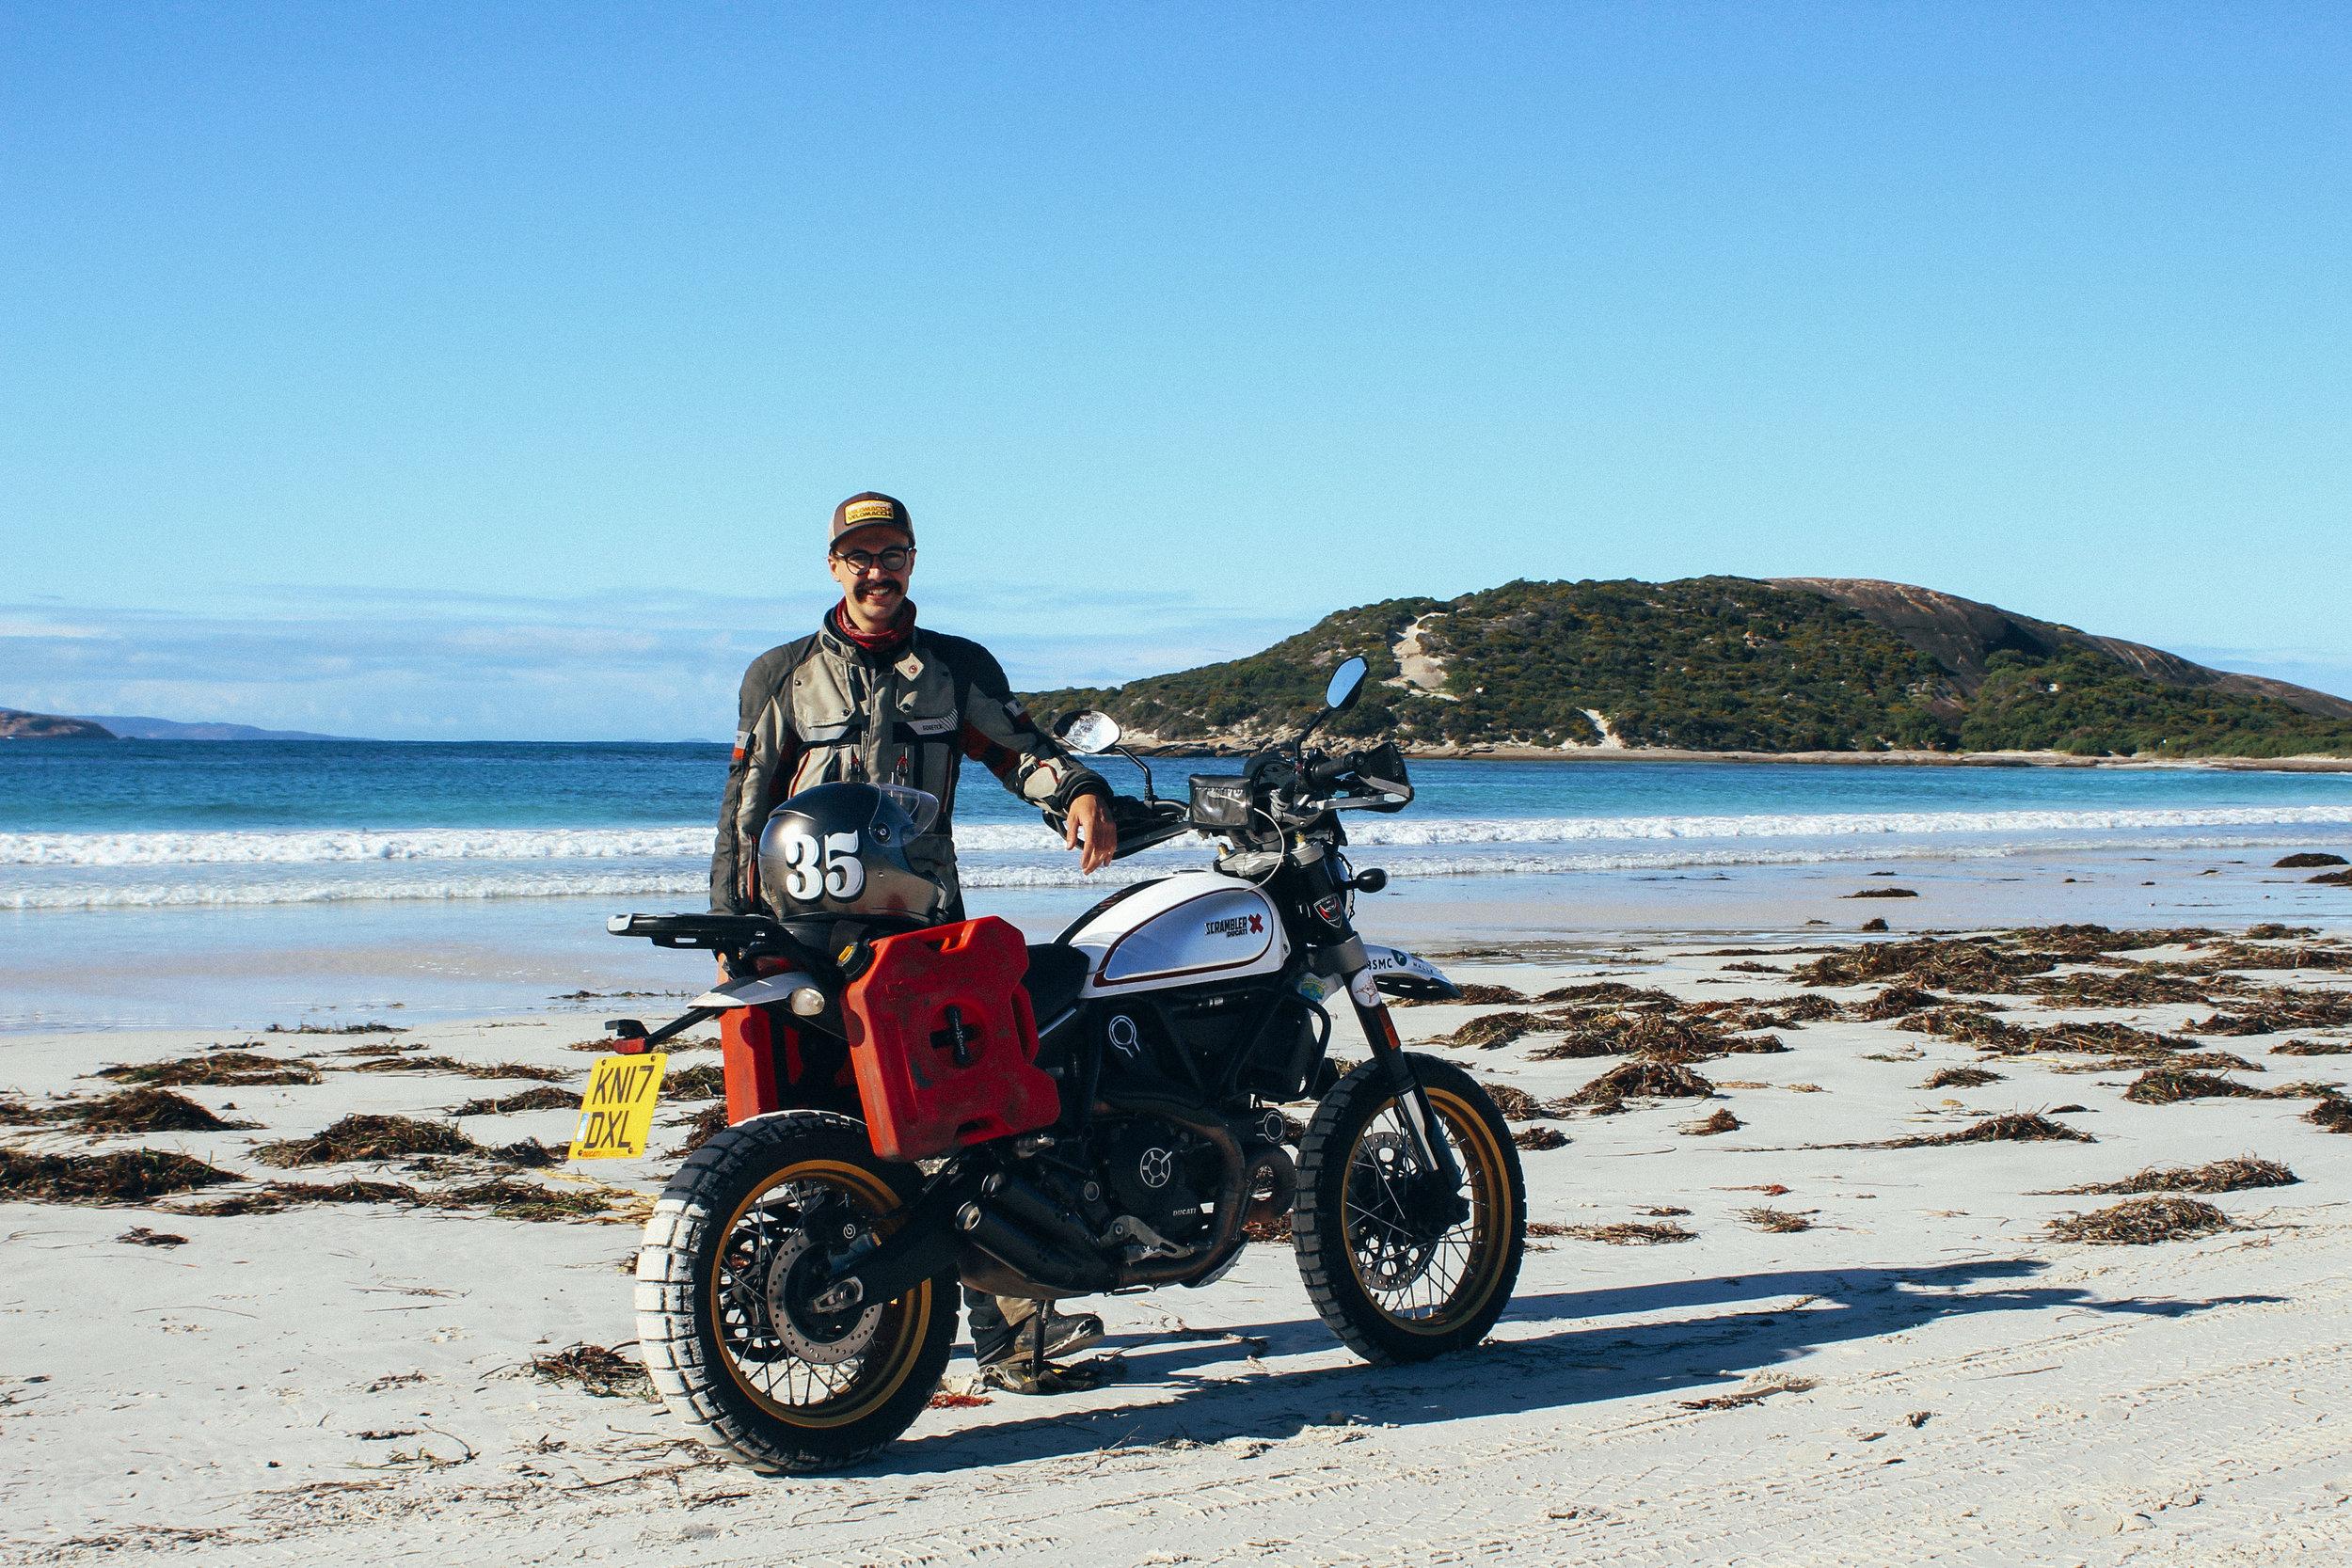 Henry-Crew-35000Miles-Adventure-Rider-Radio-Motorcycle-Podcast-10.jpg